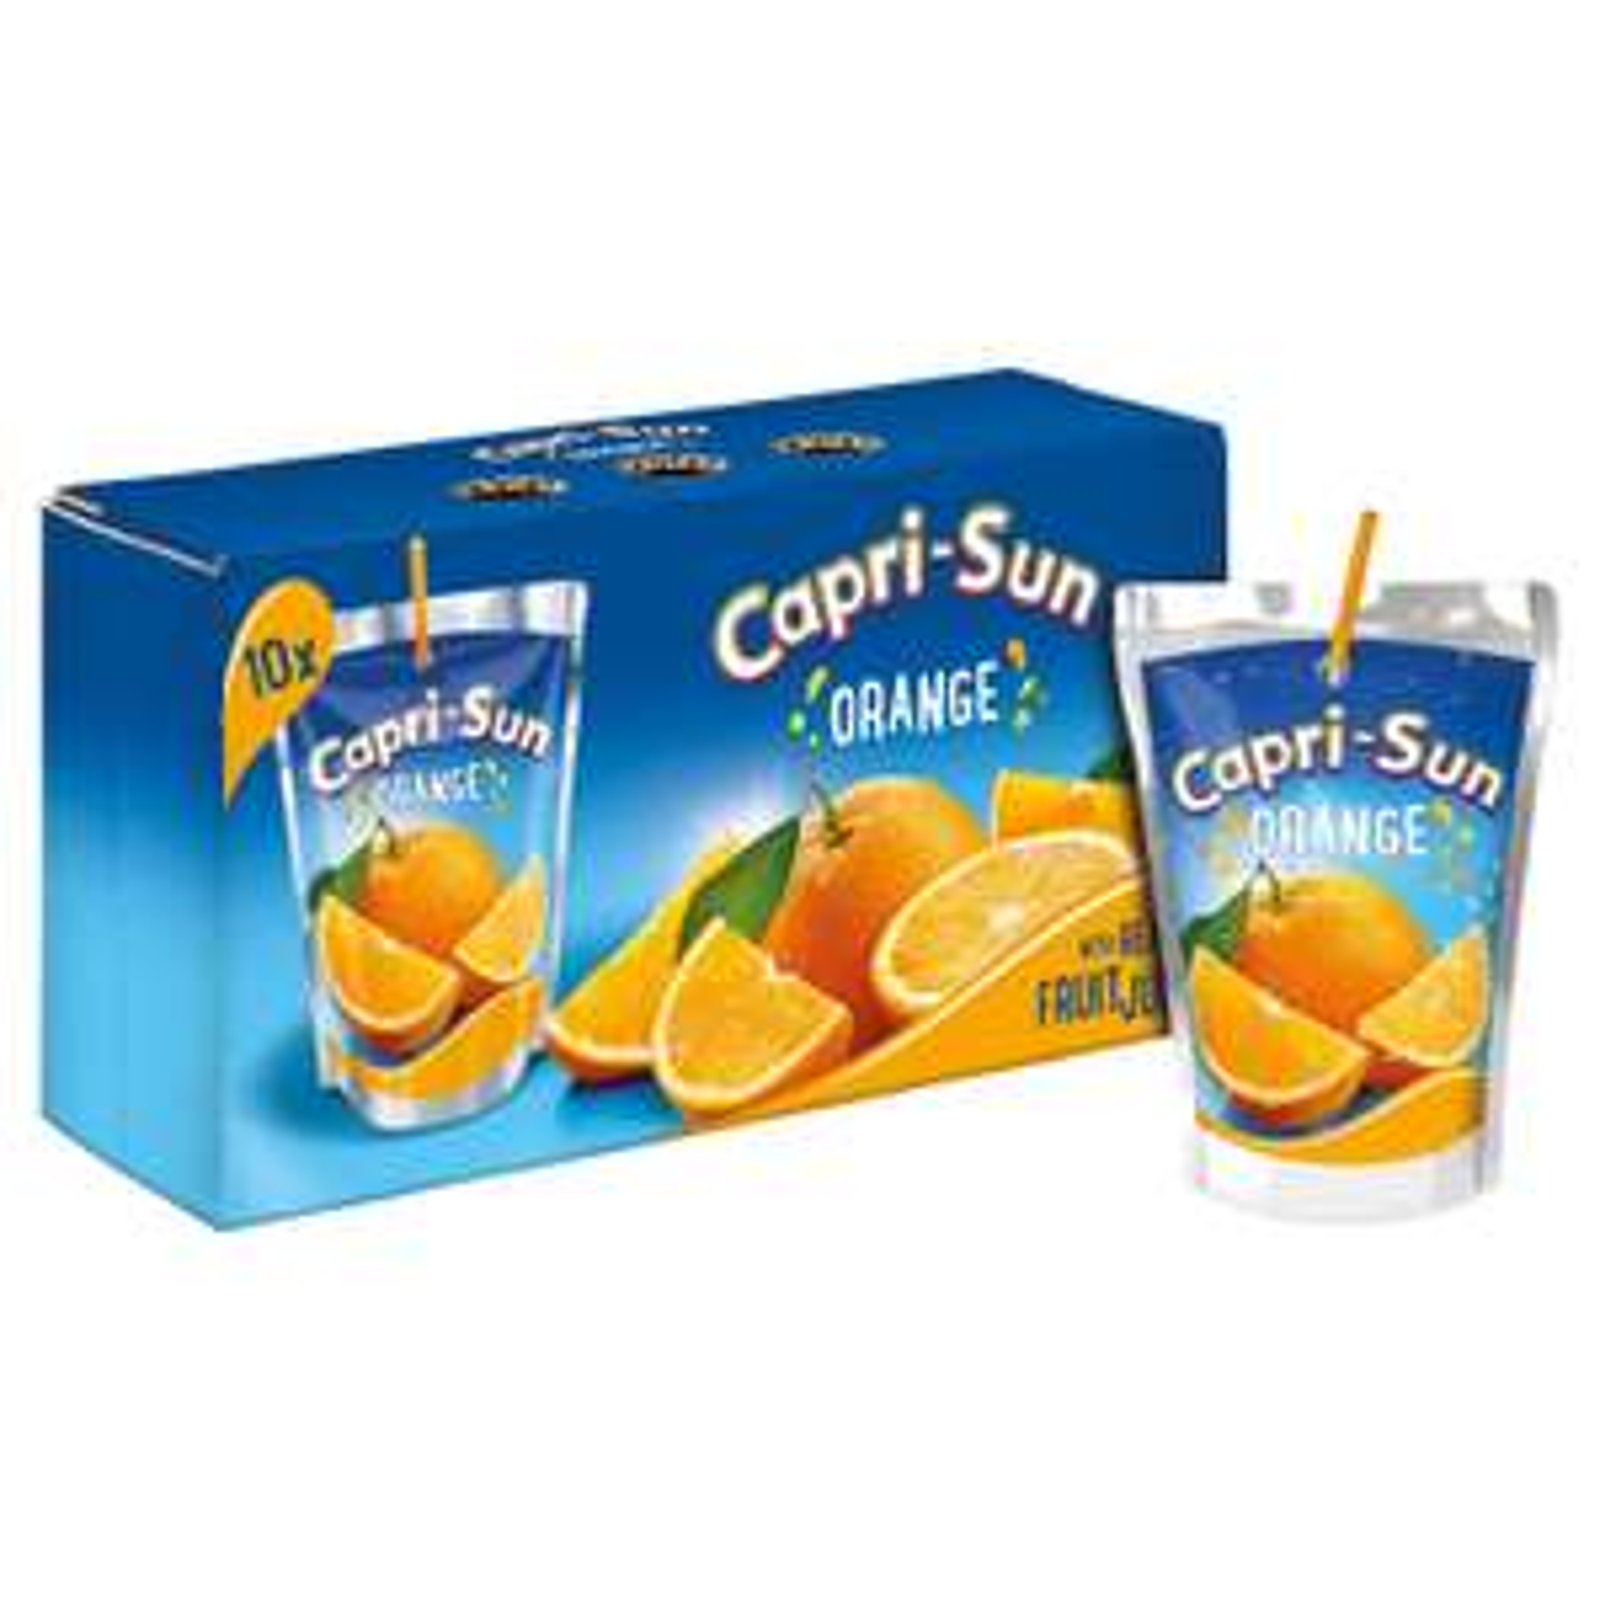 Iceland 7 Day Deal Capri-Sun Juice Drink Orange 10 x 200ml £1.89 ( starts 27/03/19)